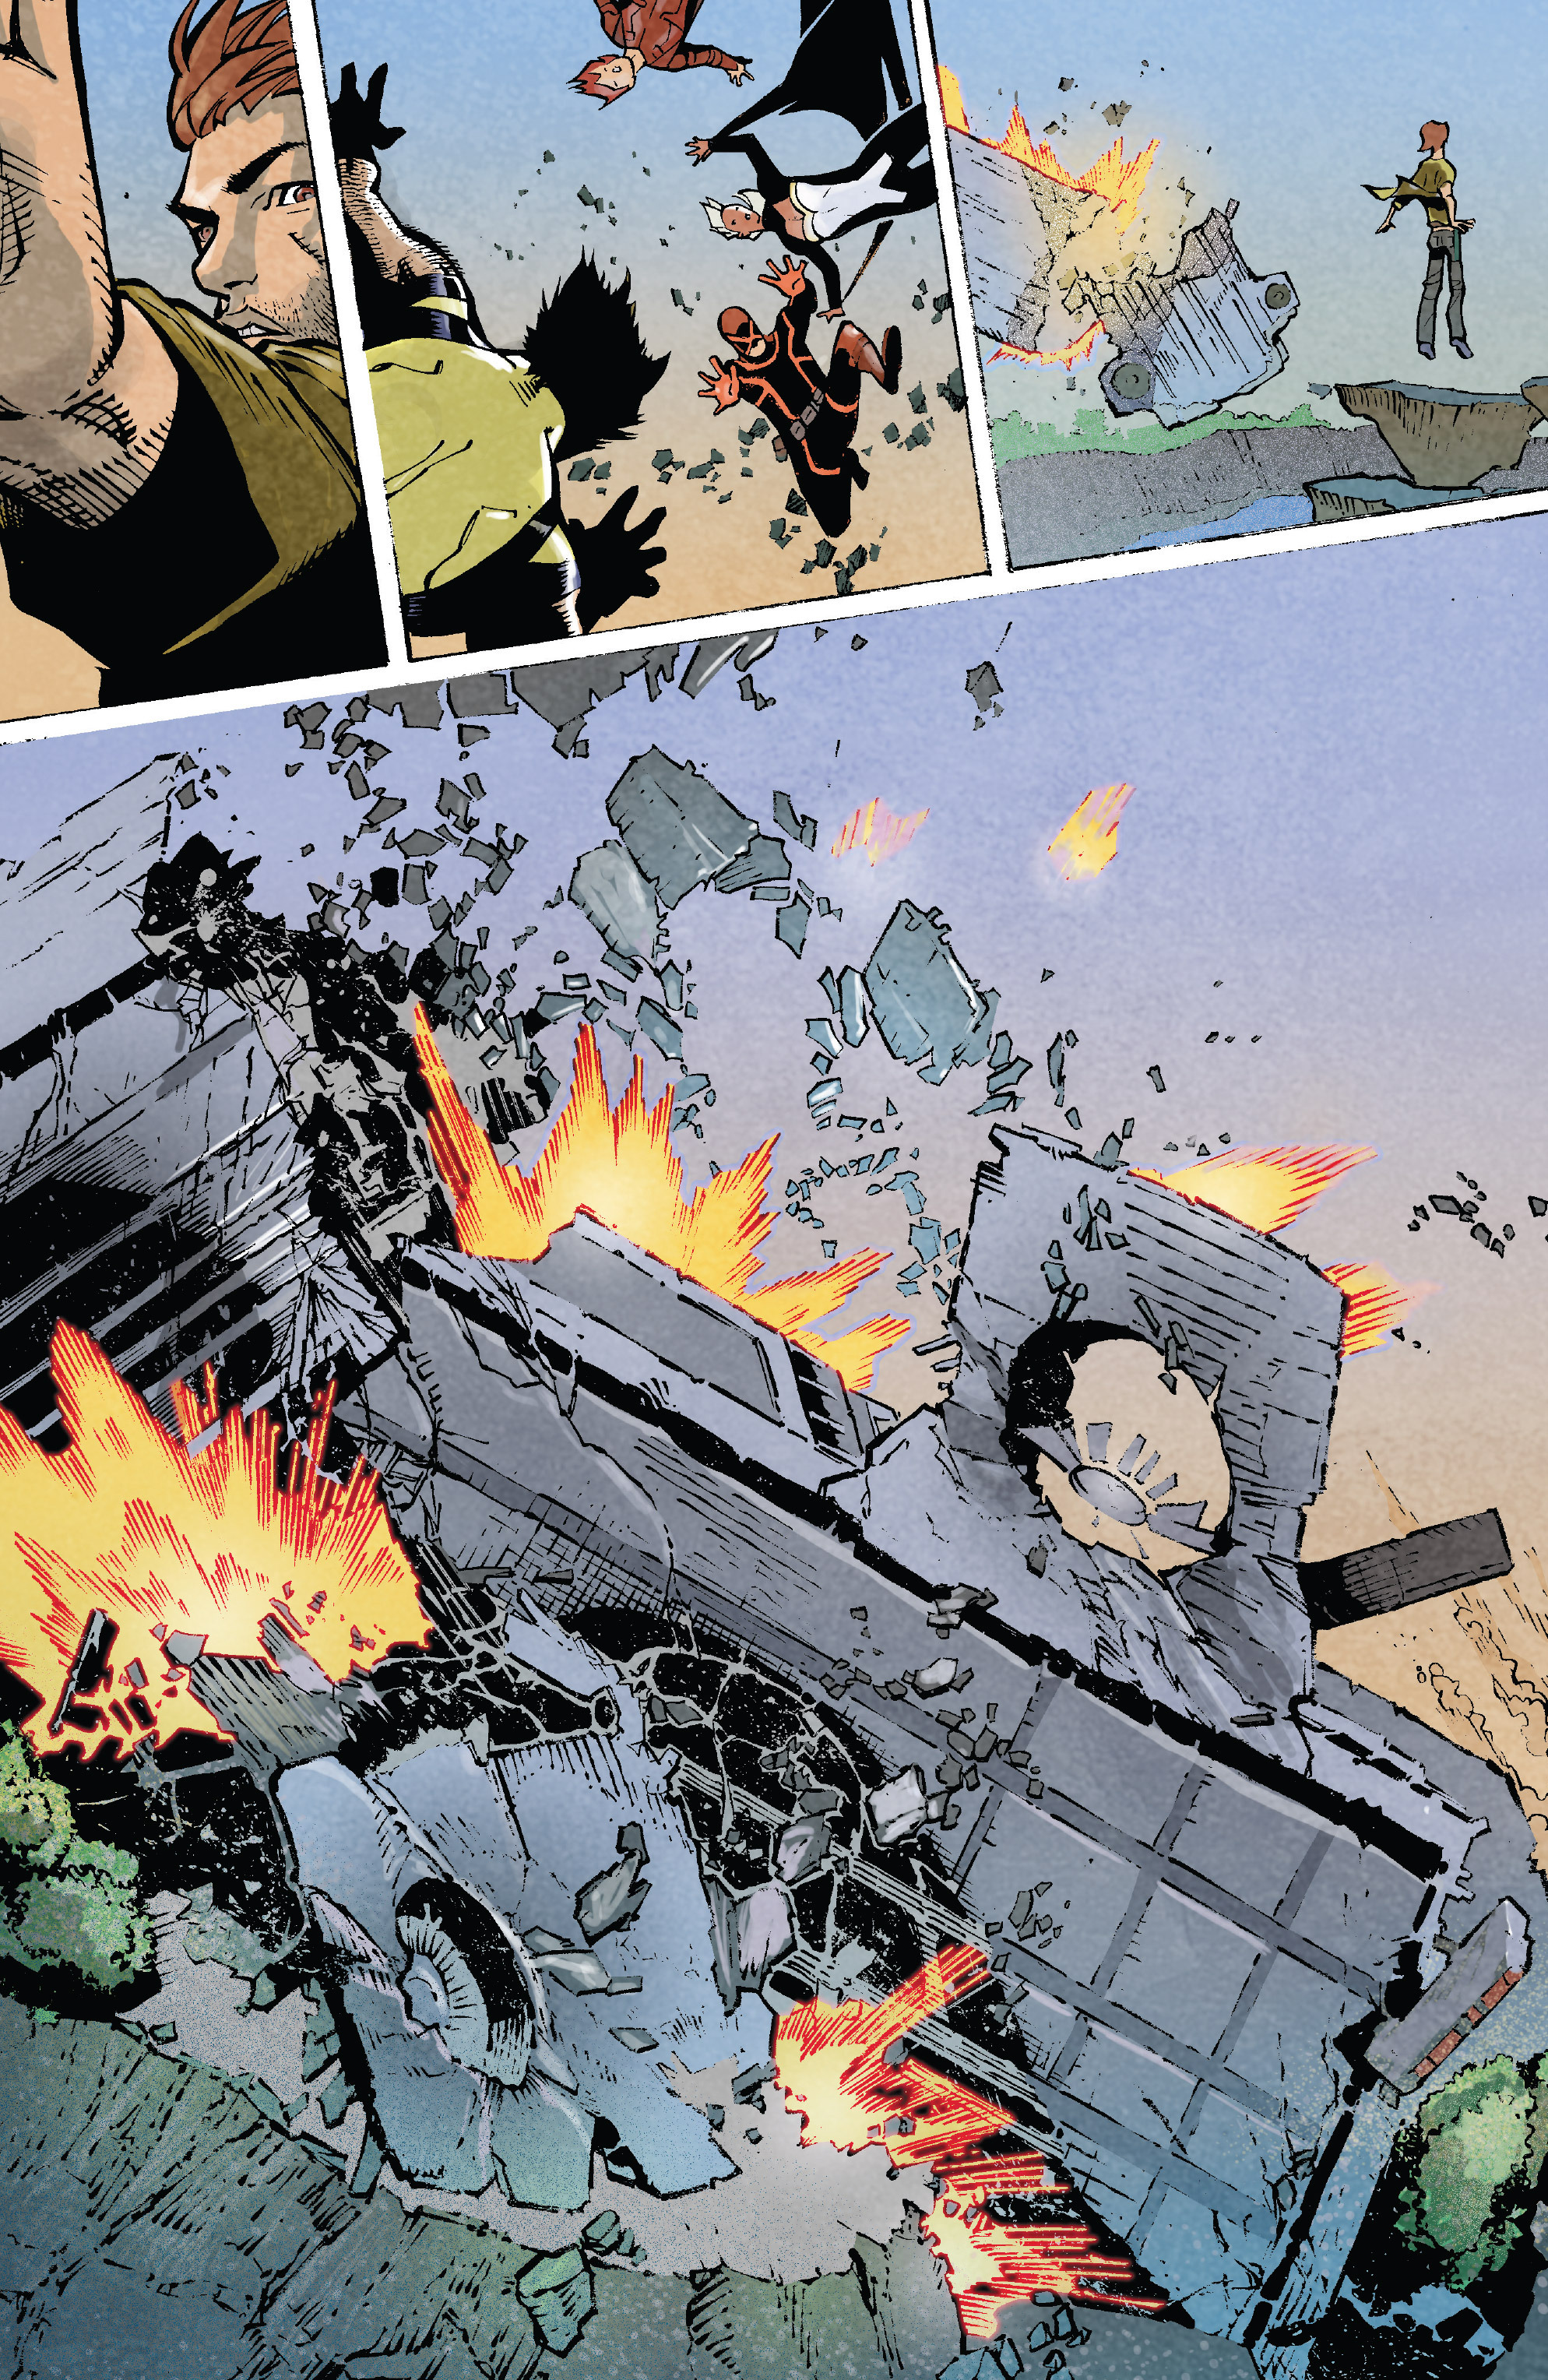 Read online Uncanny X-Men (2013) comic -  Issue # _TPB 5 - The Omega Mutant - 31